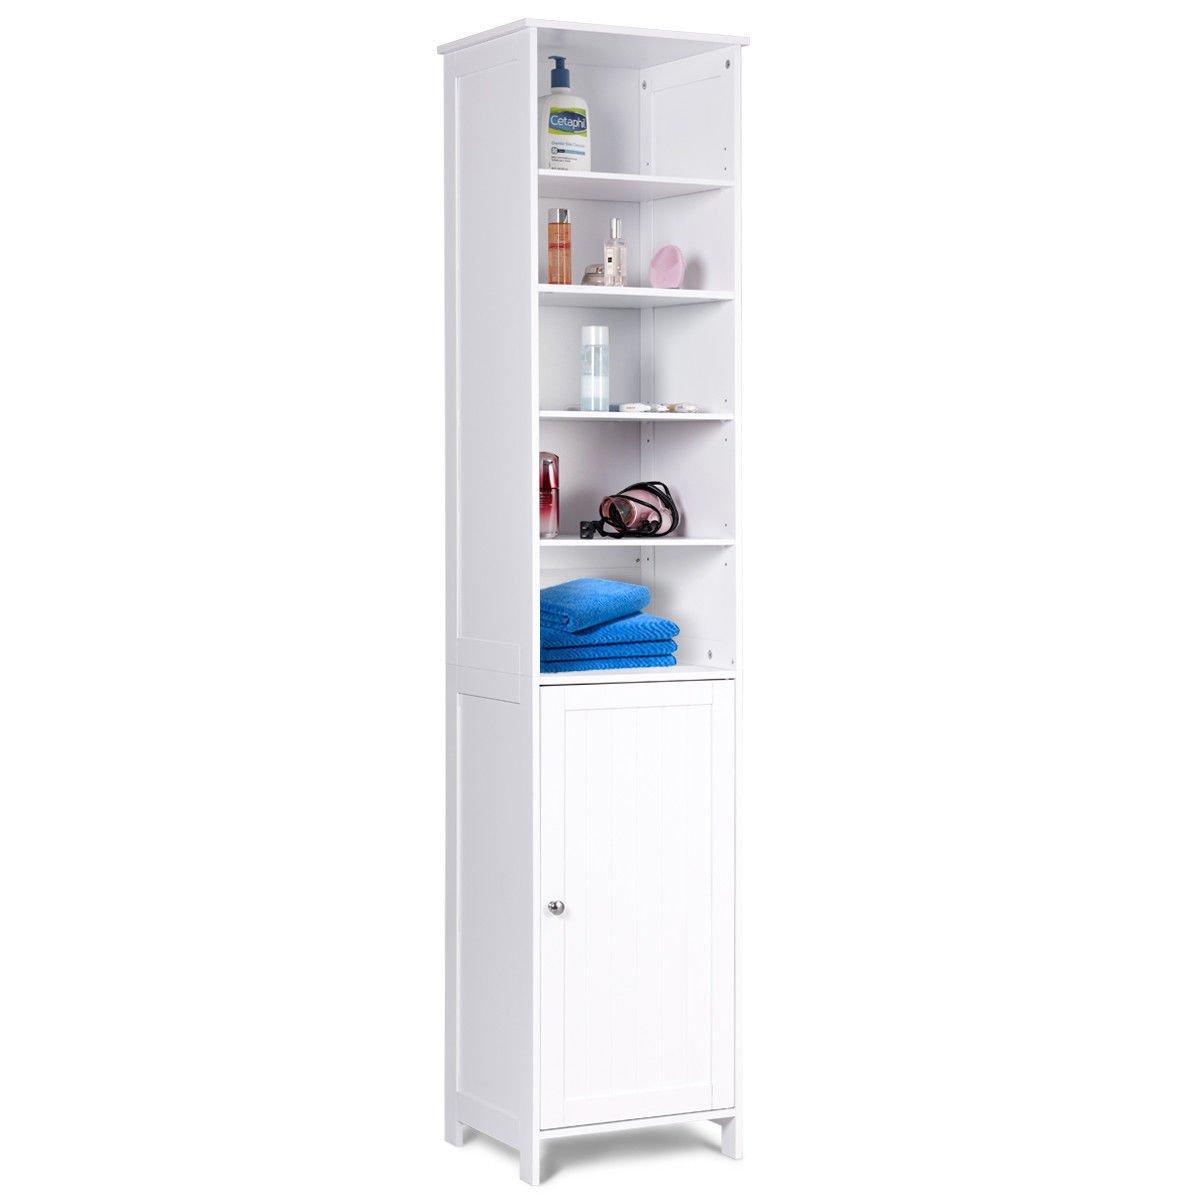 White 72''H Bathroom Tall Floor Storage Cabinet Free Standing Shelving Display Allblessings